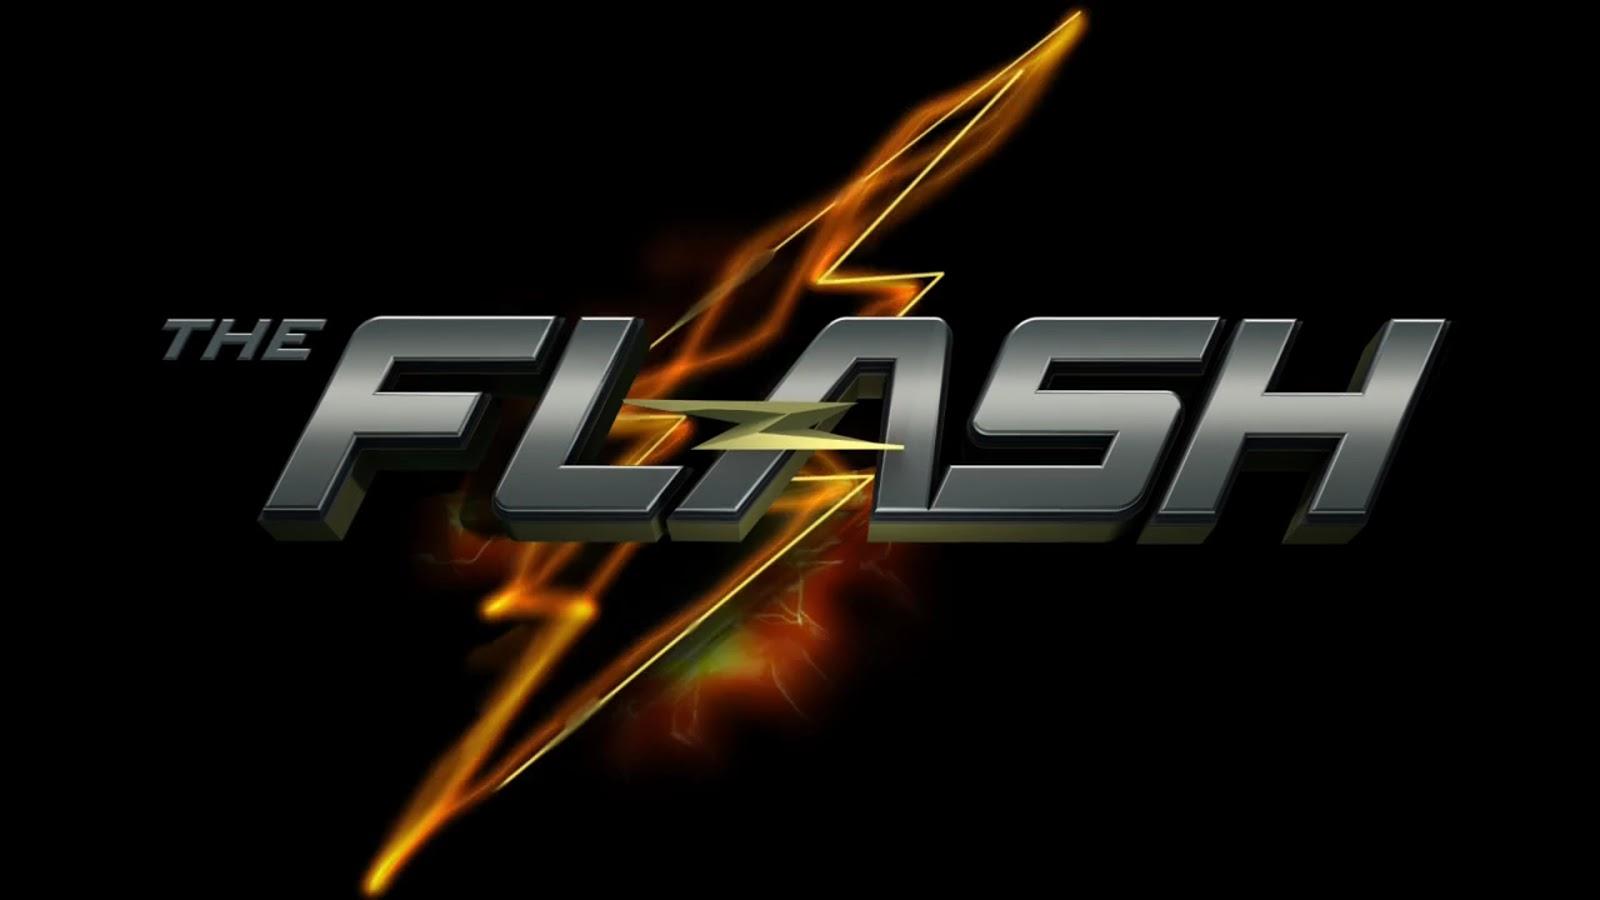 Flash Tv Show Season 1